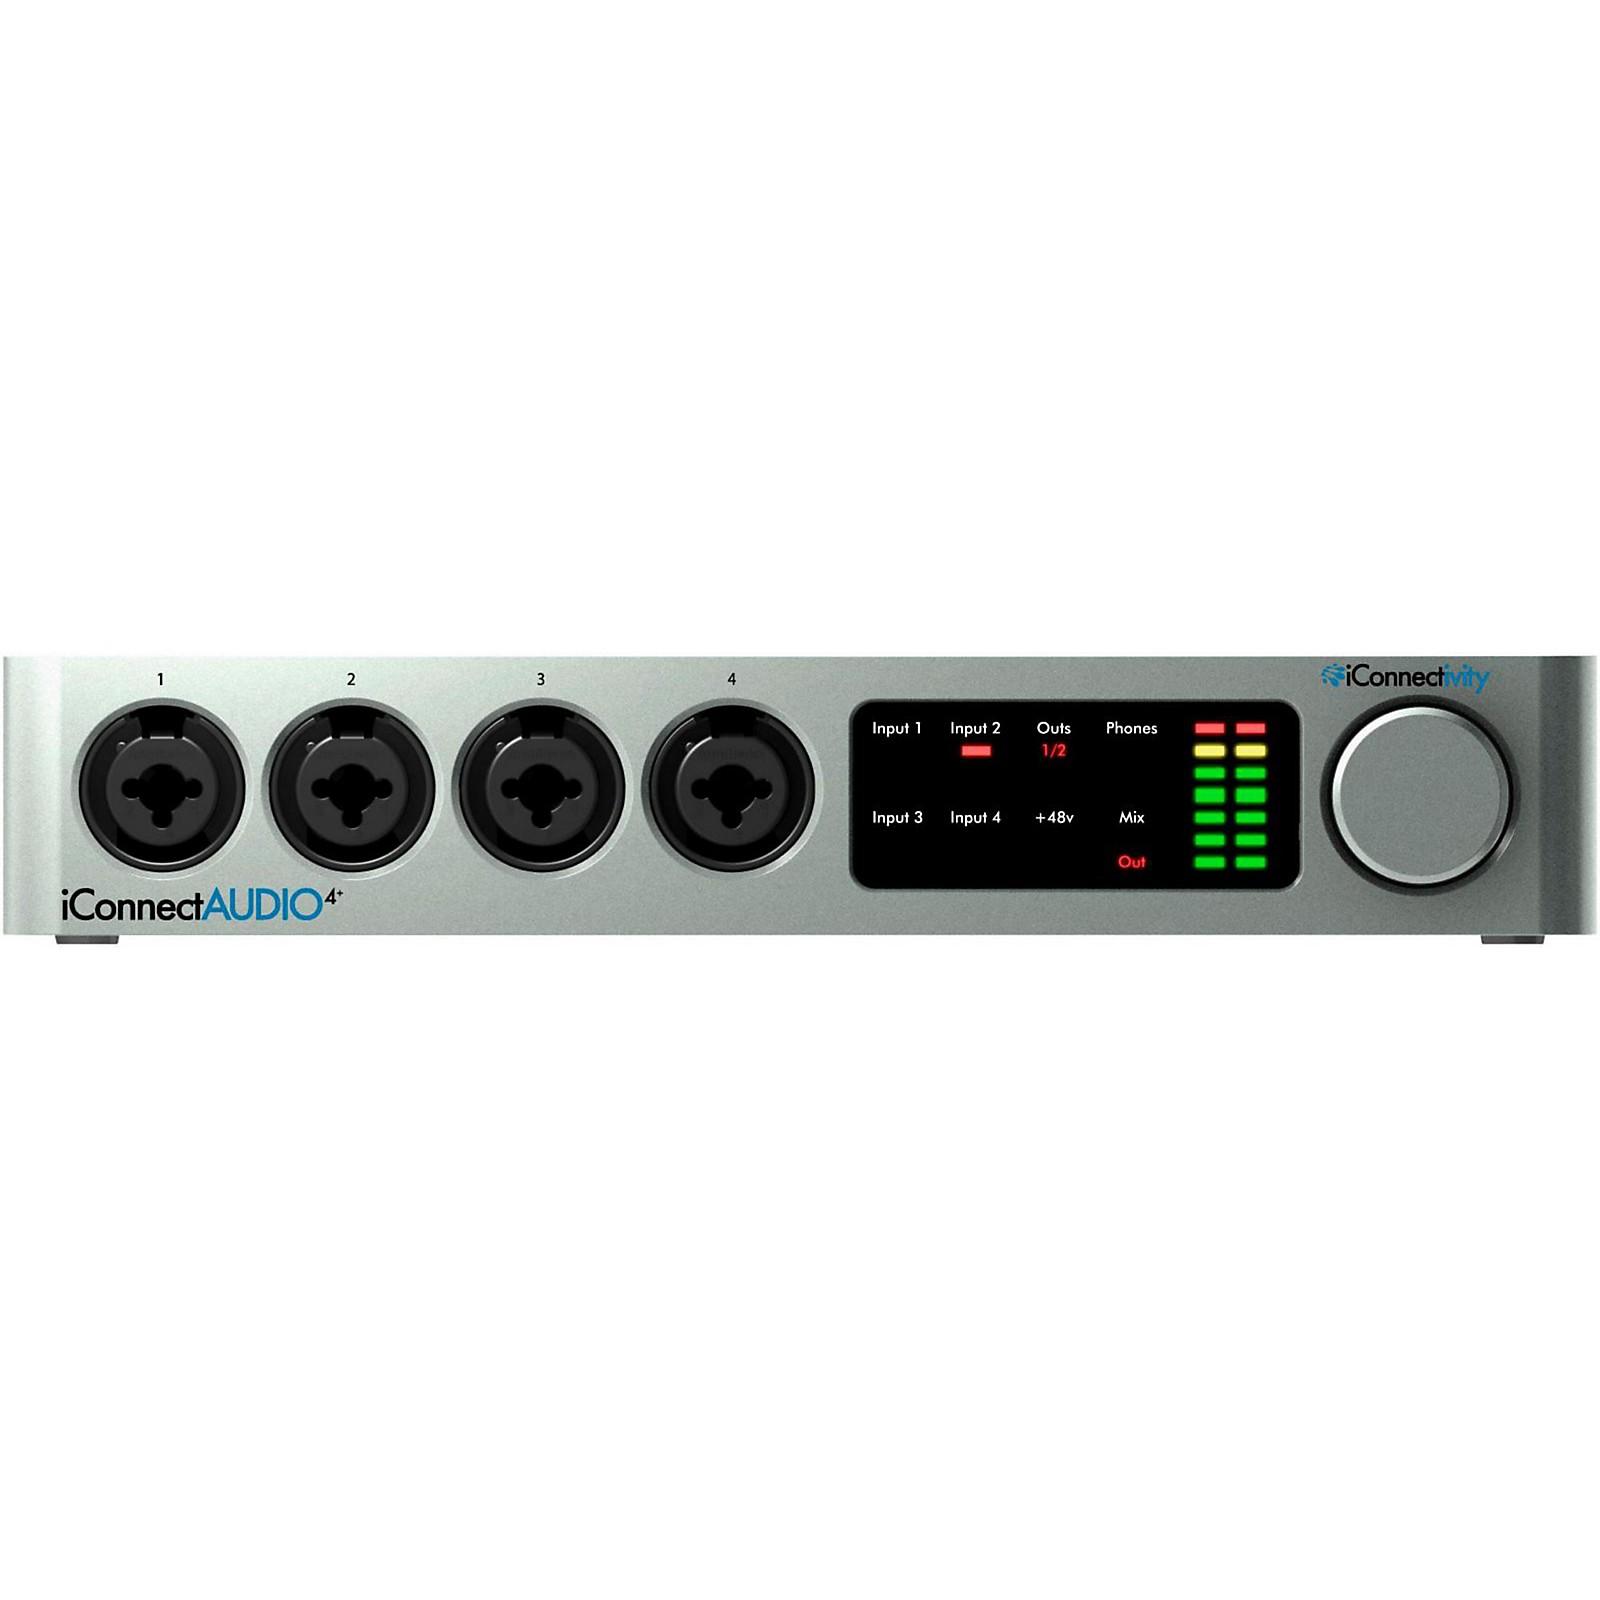 iConnectivity iConnectAUDIO4+ Audio/MIDI Interface for iOS/Mac/PC